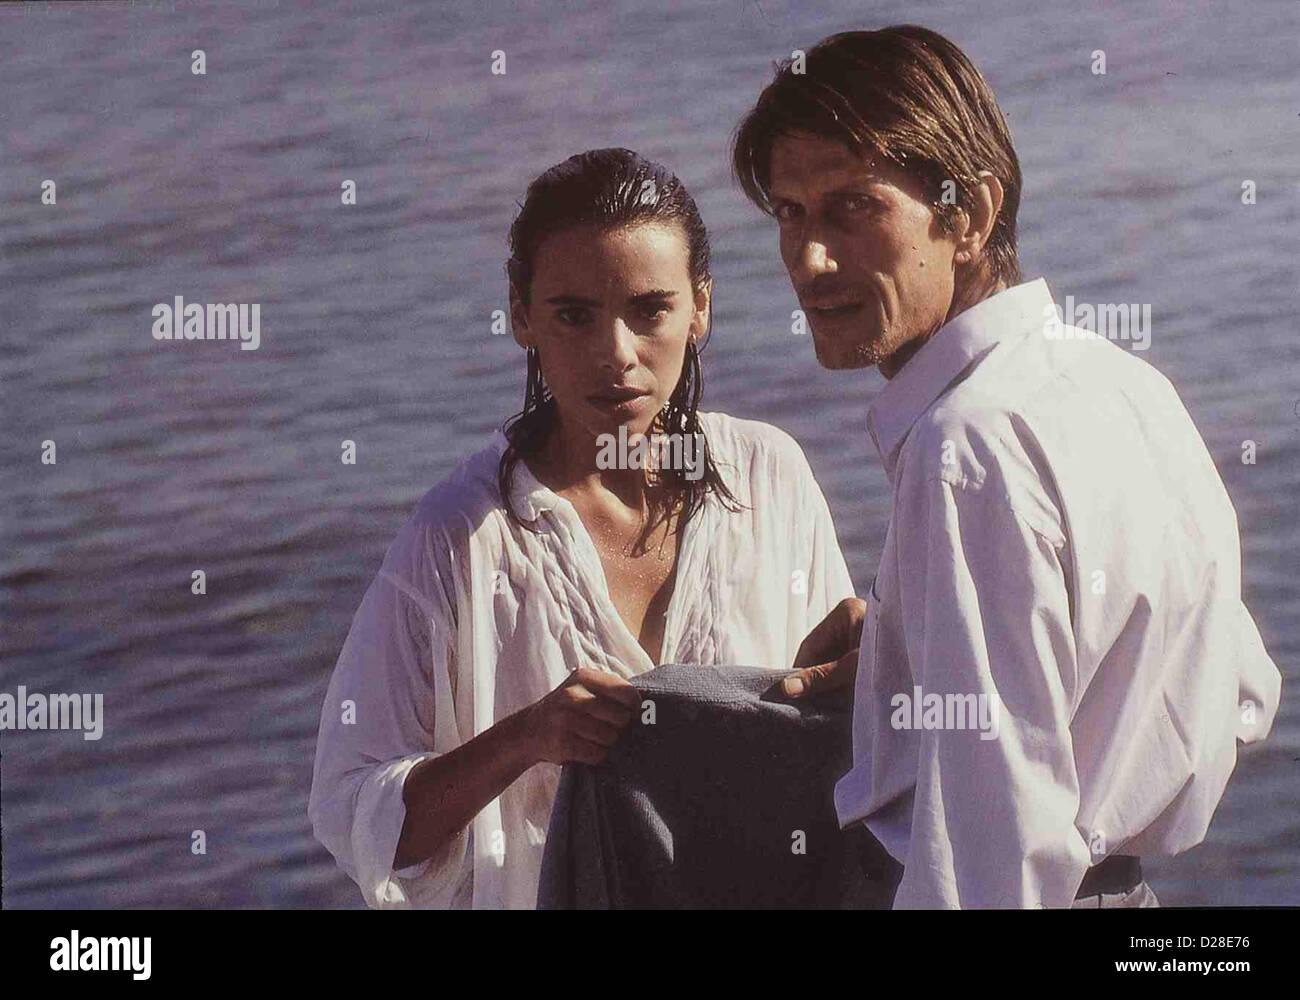 Sweetheart   Toutes Peines Confondues   Jeanne (Mathilda May) mit Gardella (Jacques Dutronc)  *** Local Caption - Stock Image